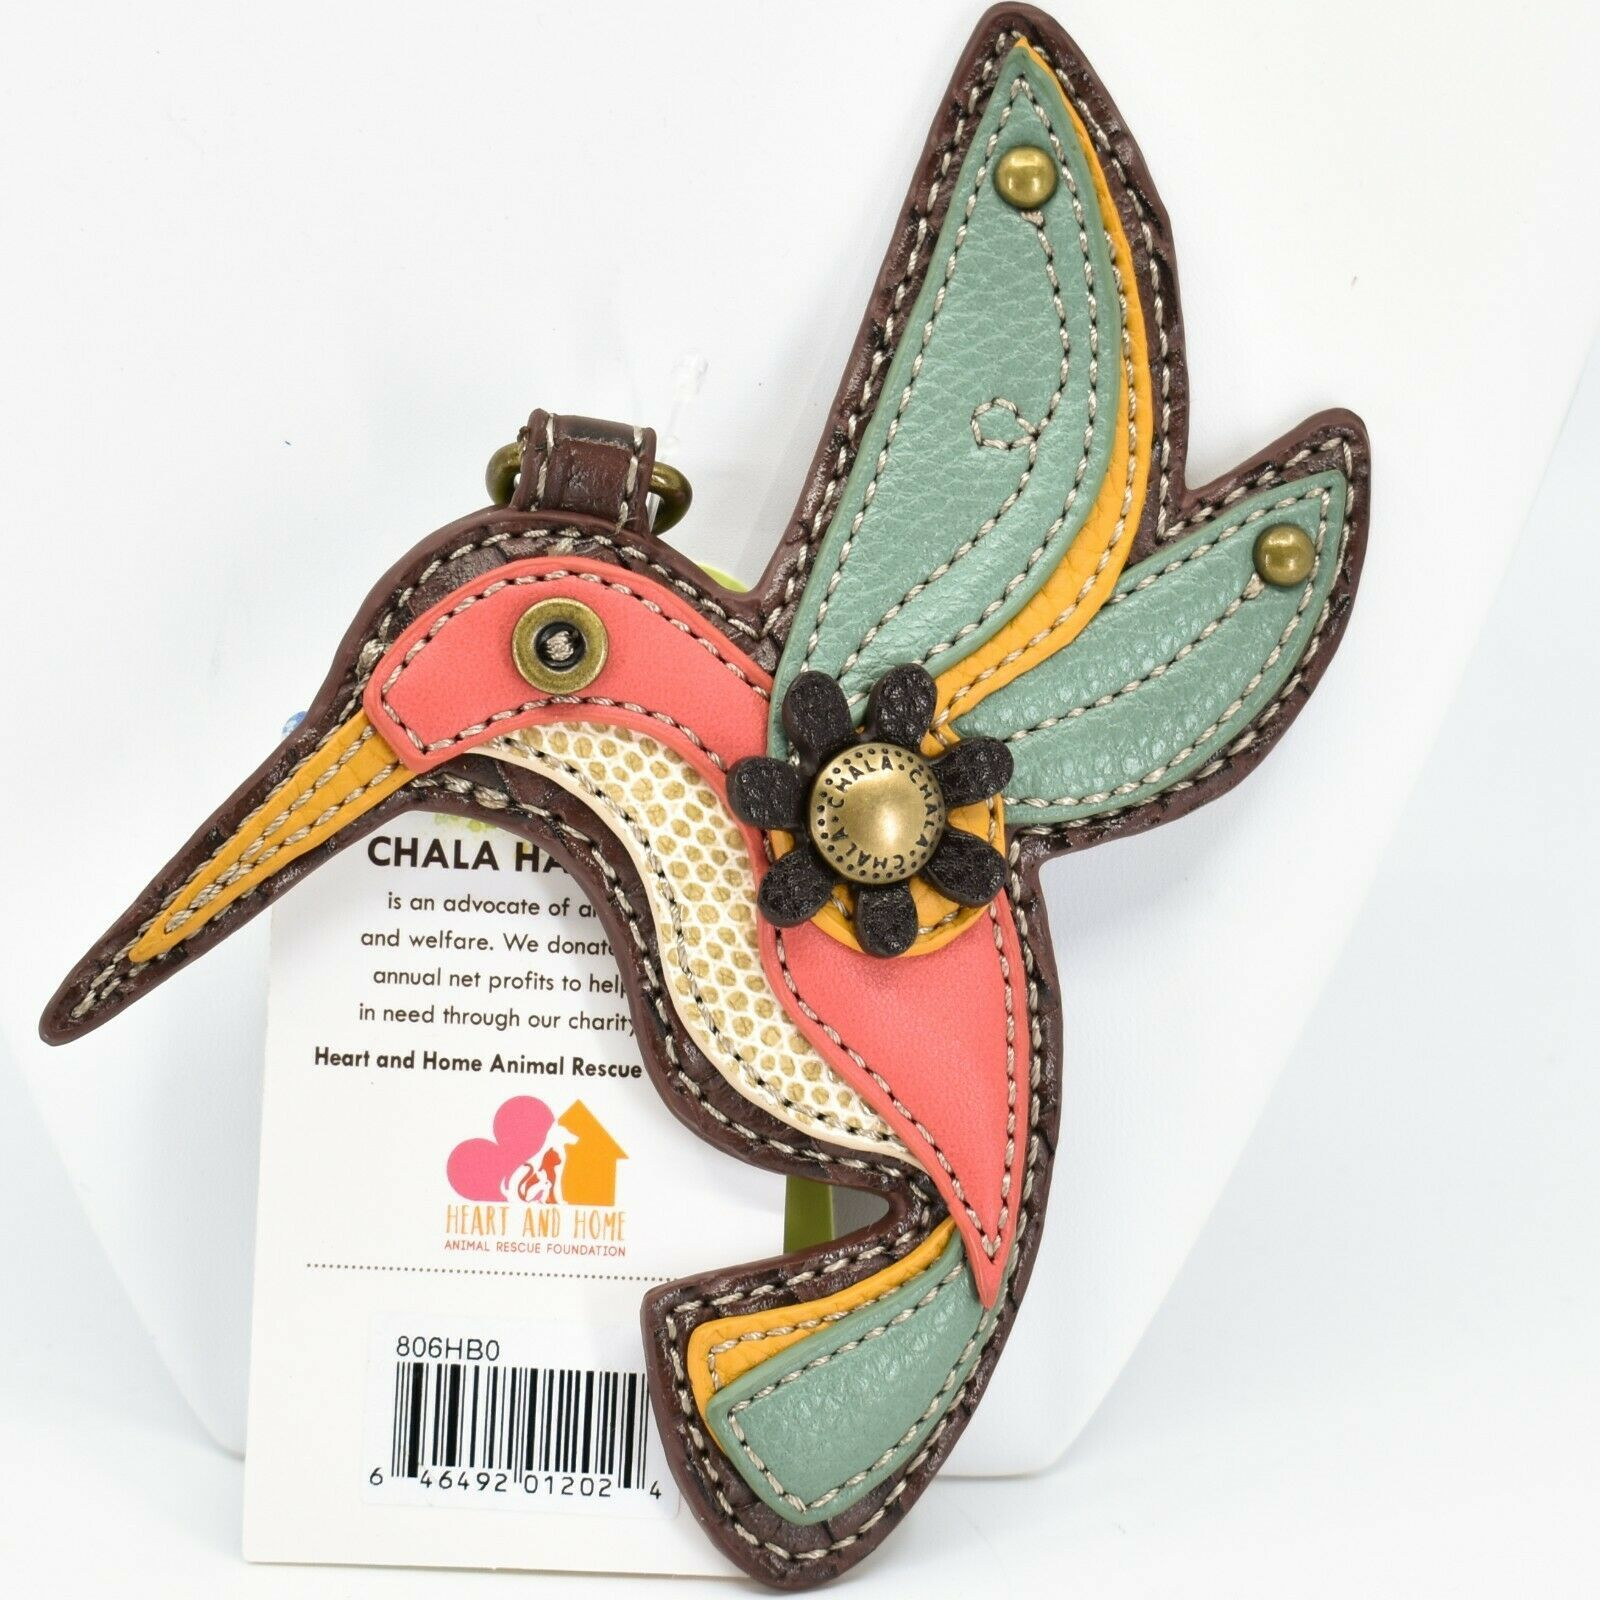 Chala Handbags Faux Leather Whimsical Hummingbird Charm Key Chain Keychain